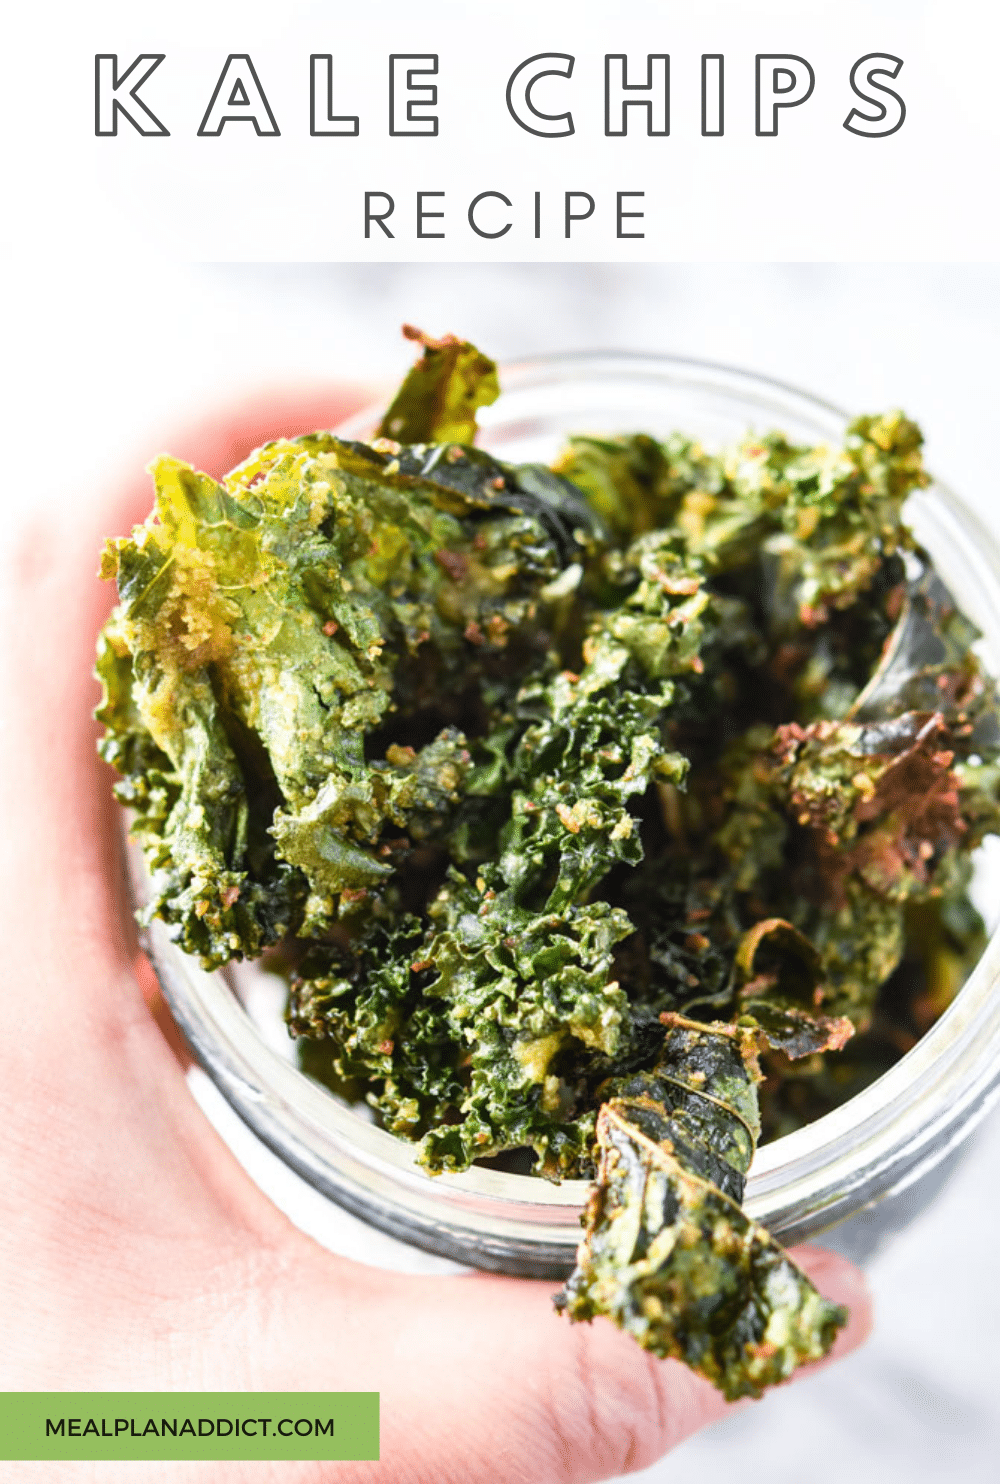 Kale Chips Recipe | Meal Plan Addict